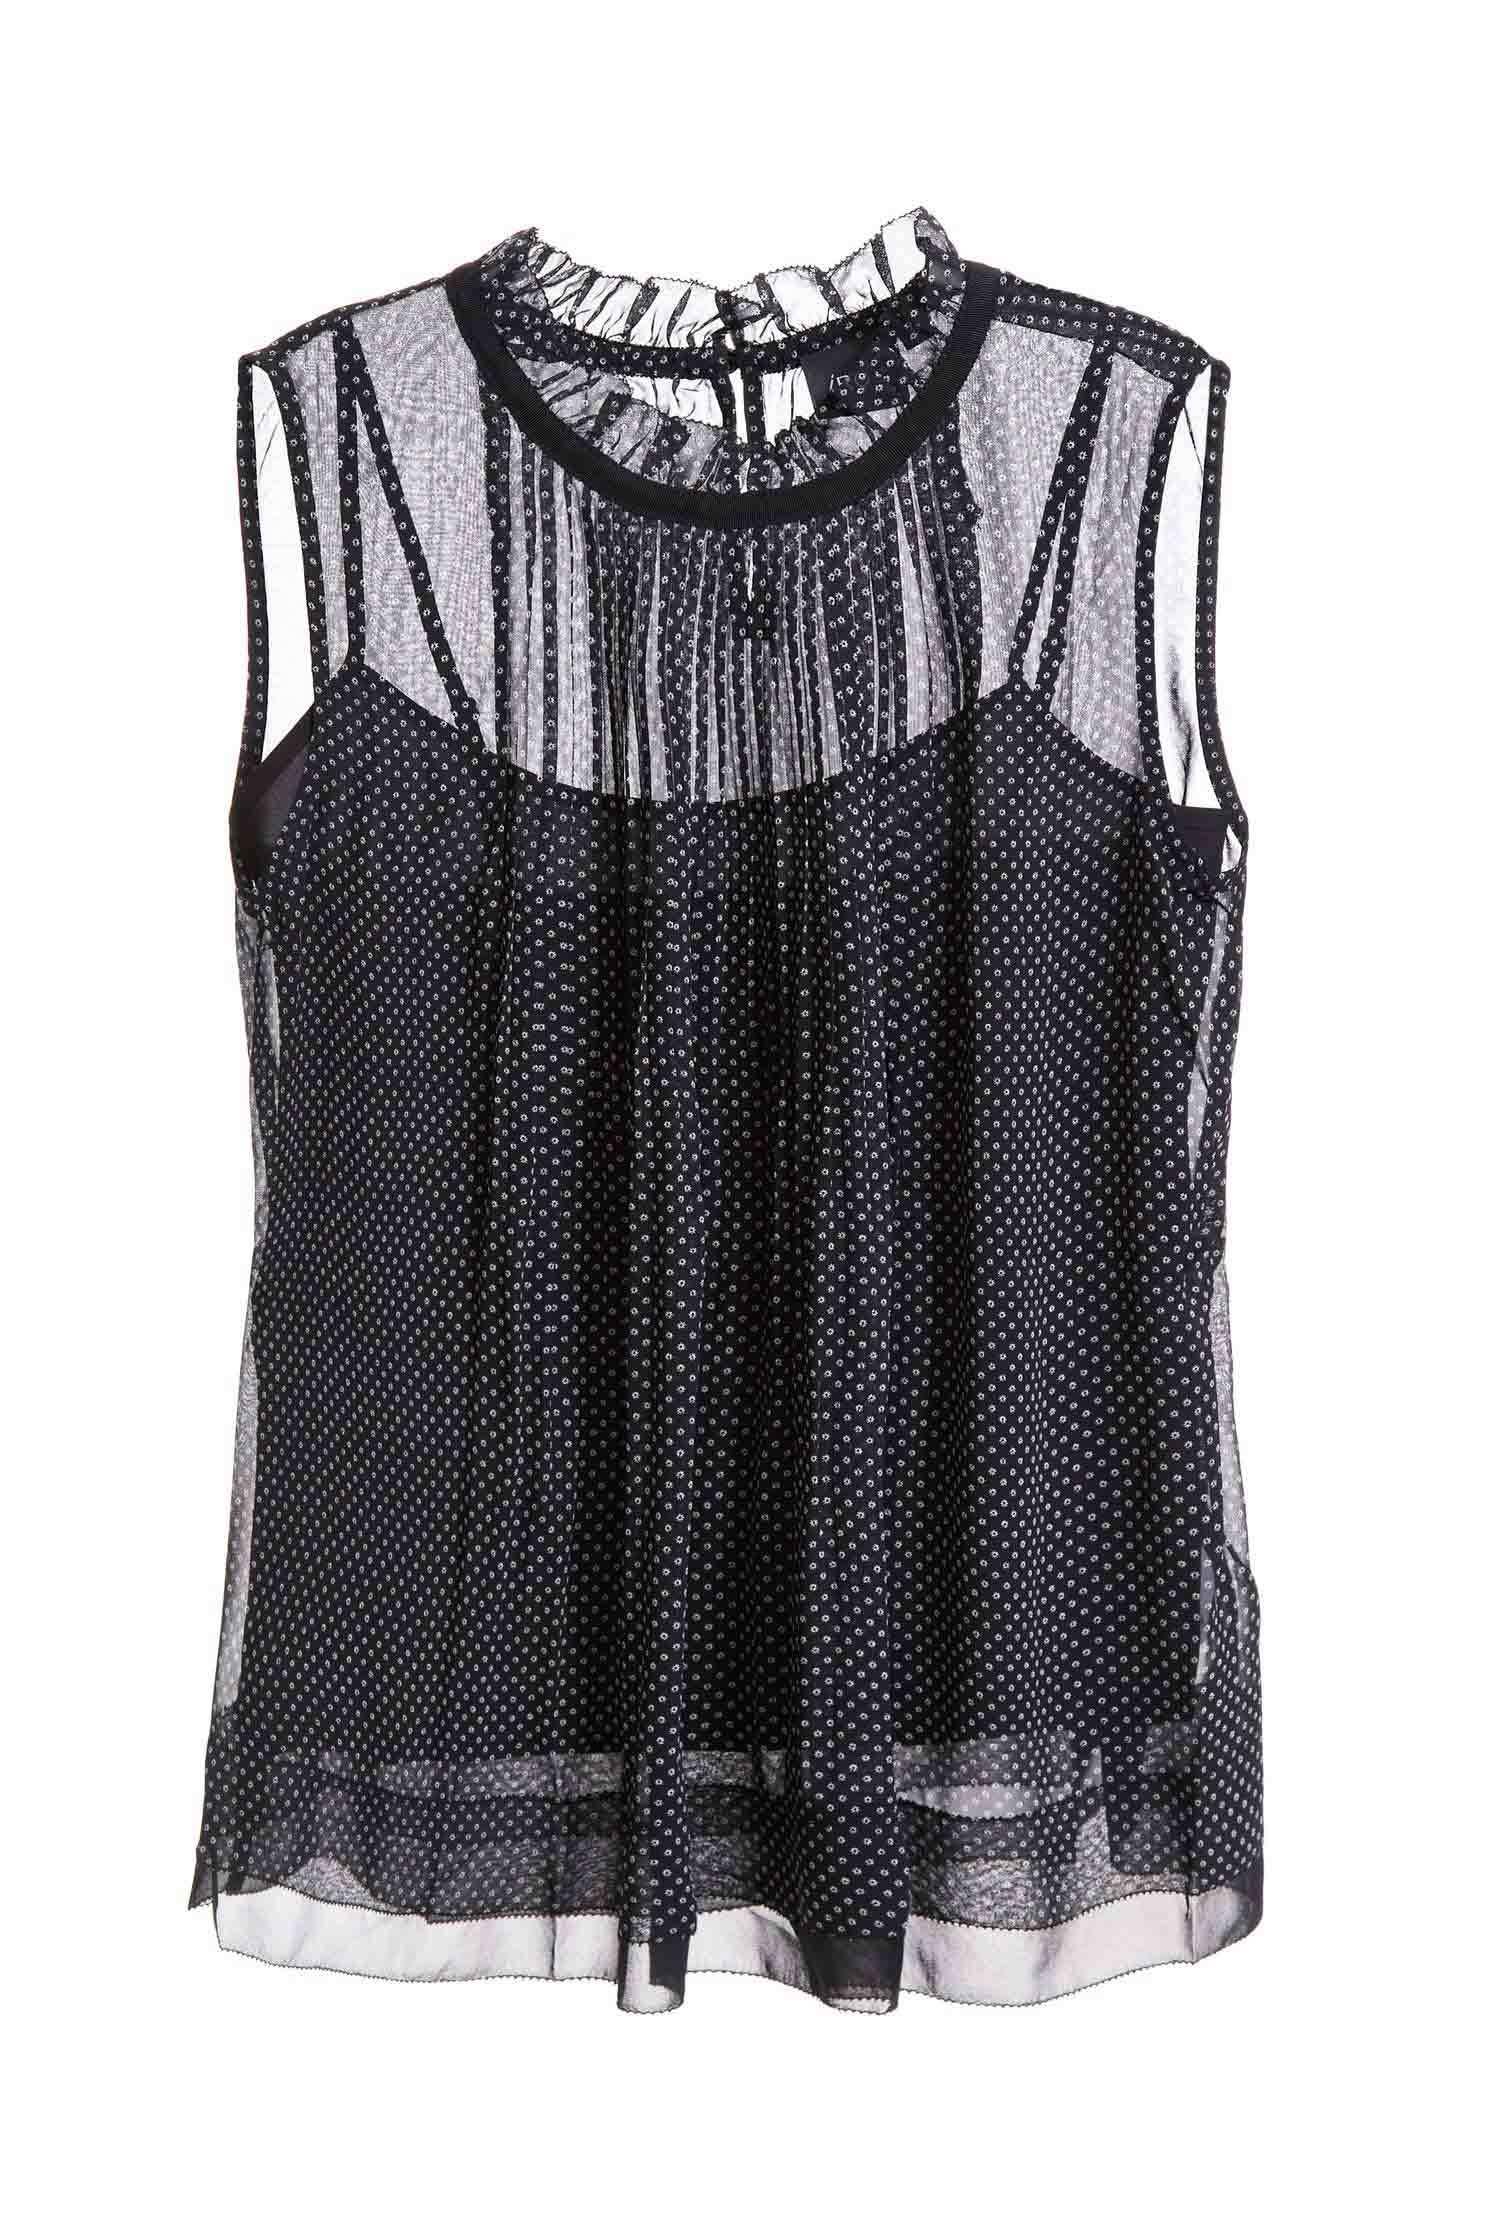 Elegant and slightly transparent chiffon vest